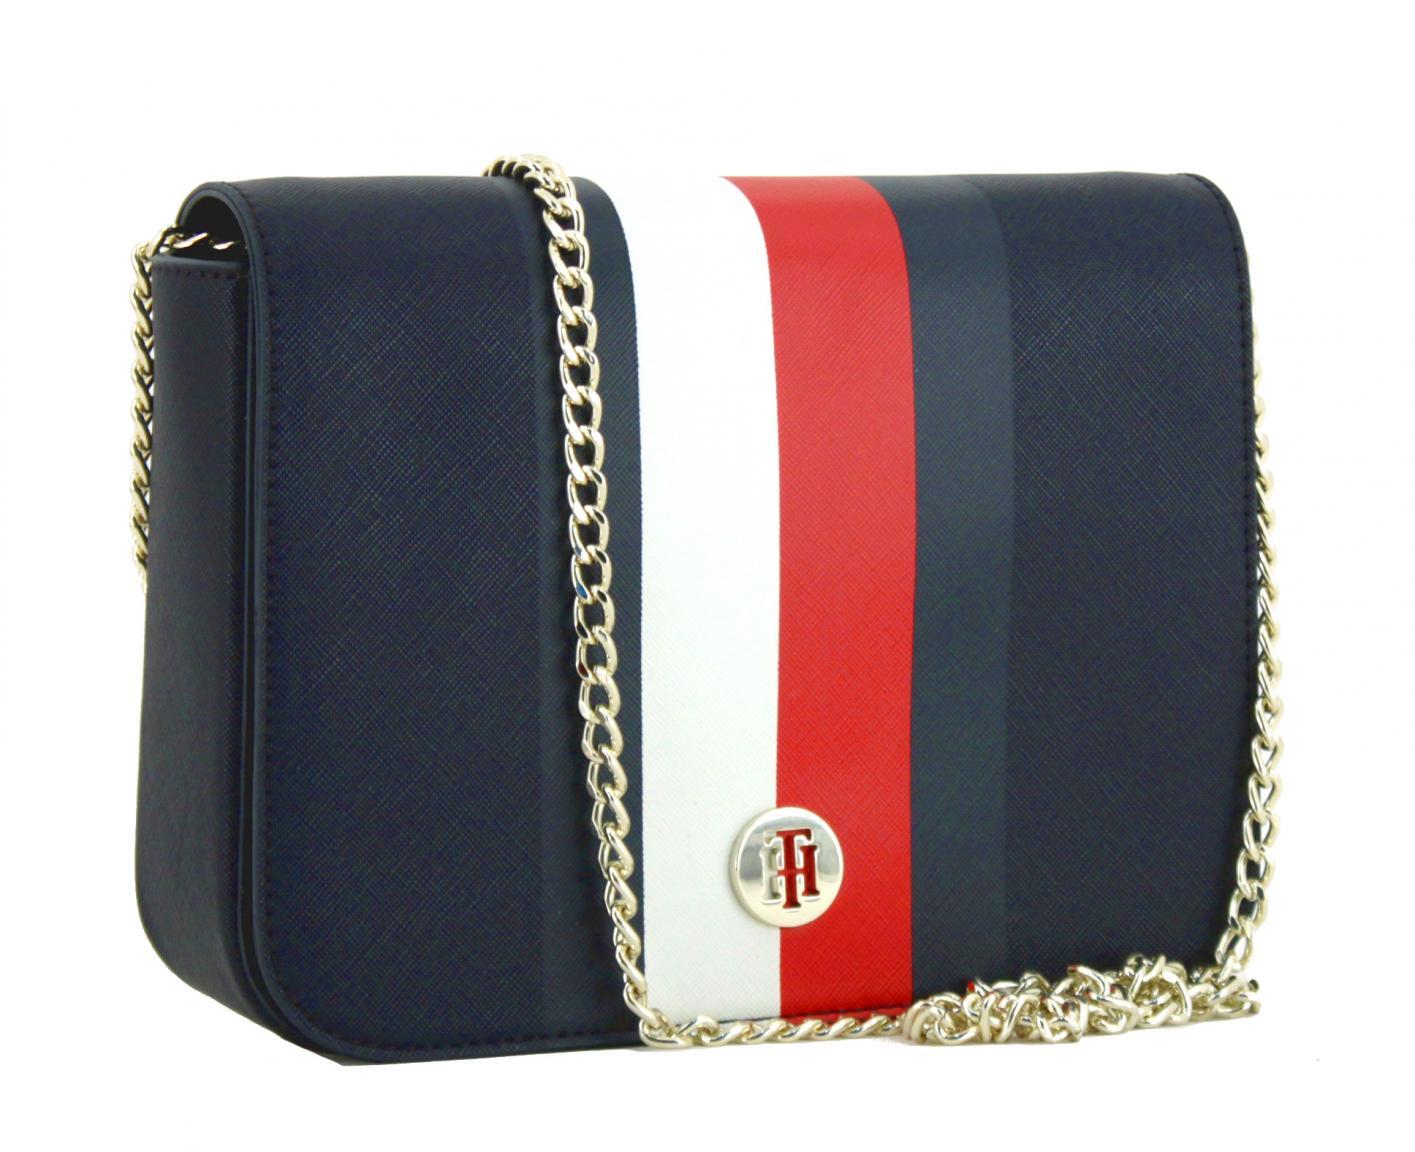 8797186131277 Crossbody Bag Tommy Hilfiger Honey Corporate Stripes blau Kette ...